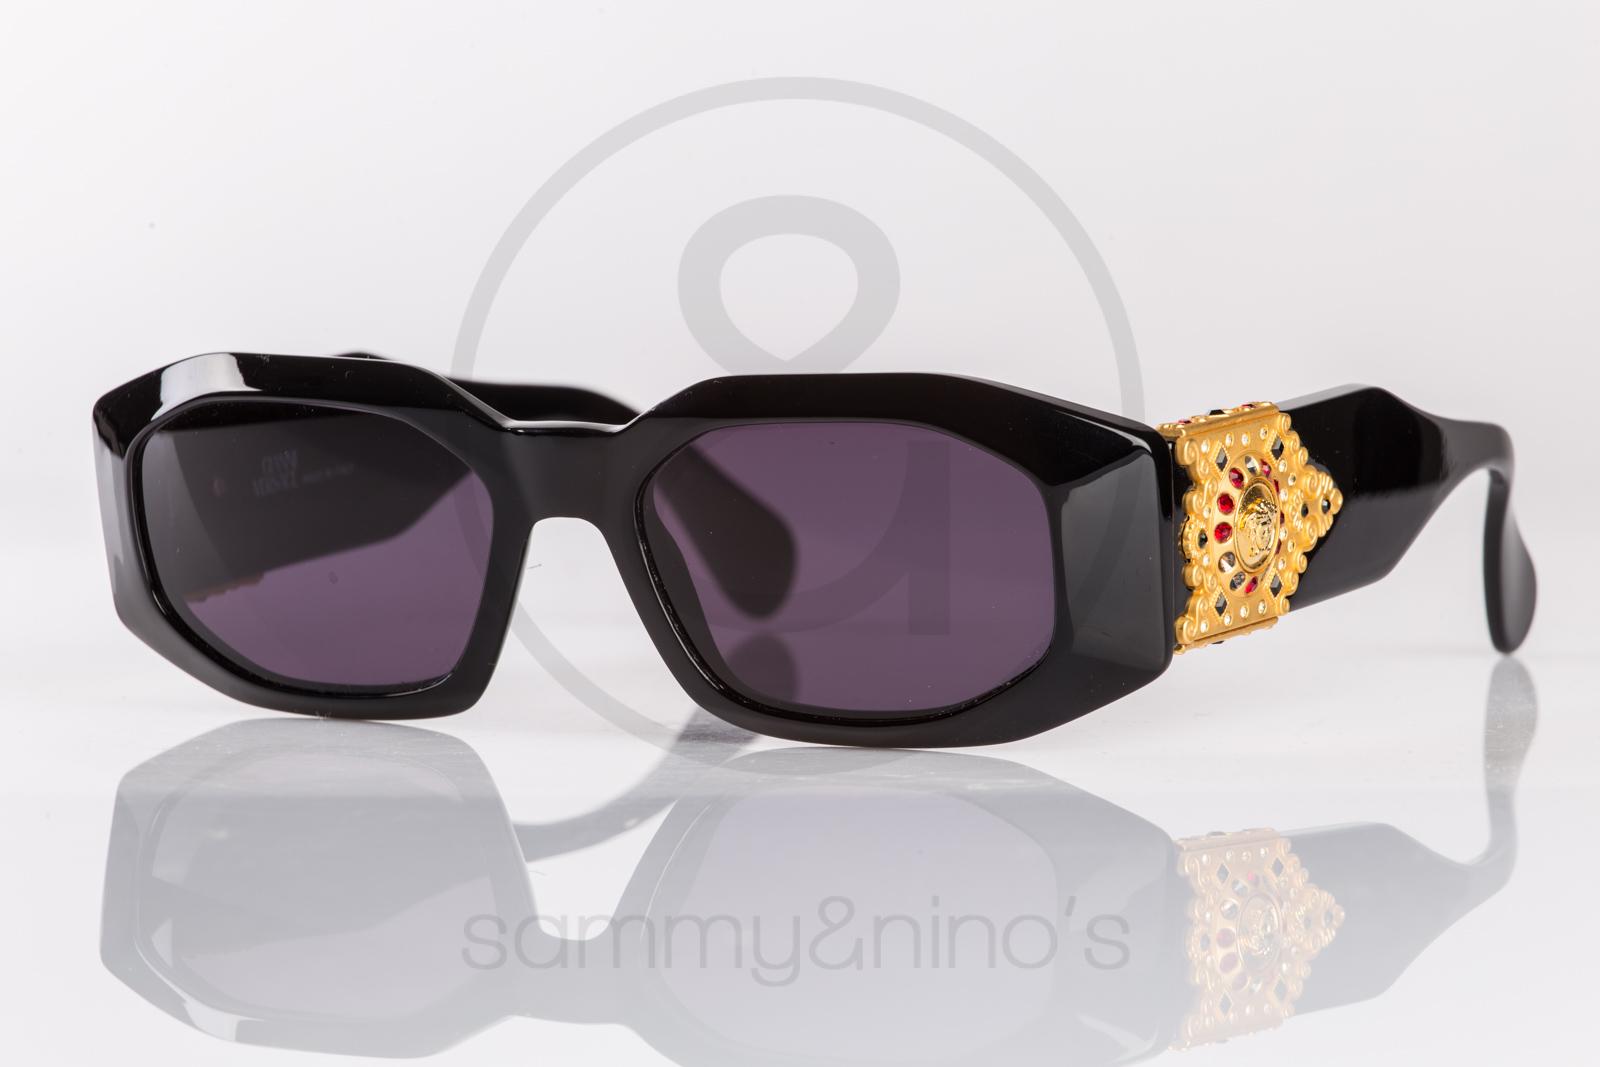 2a2458e98d0b Gianni Versace 414/h 852 – Sammy & Nino's Store